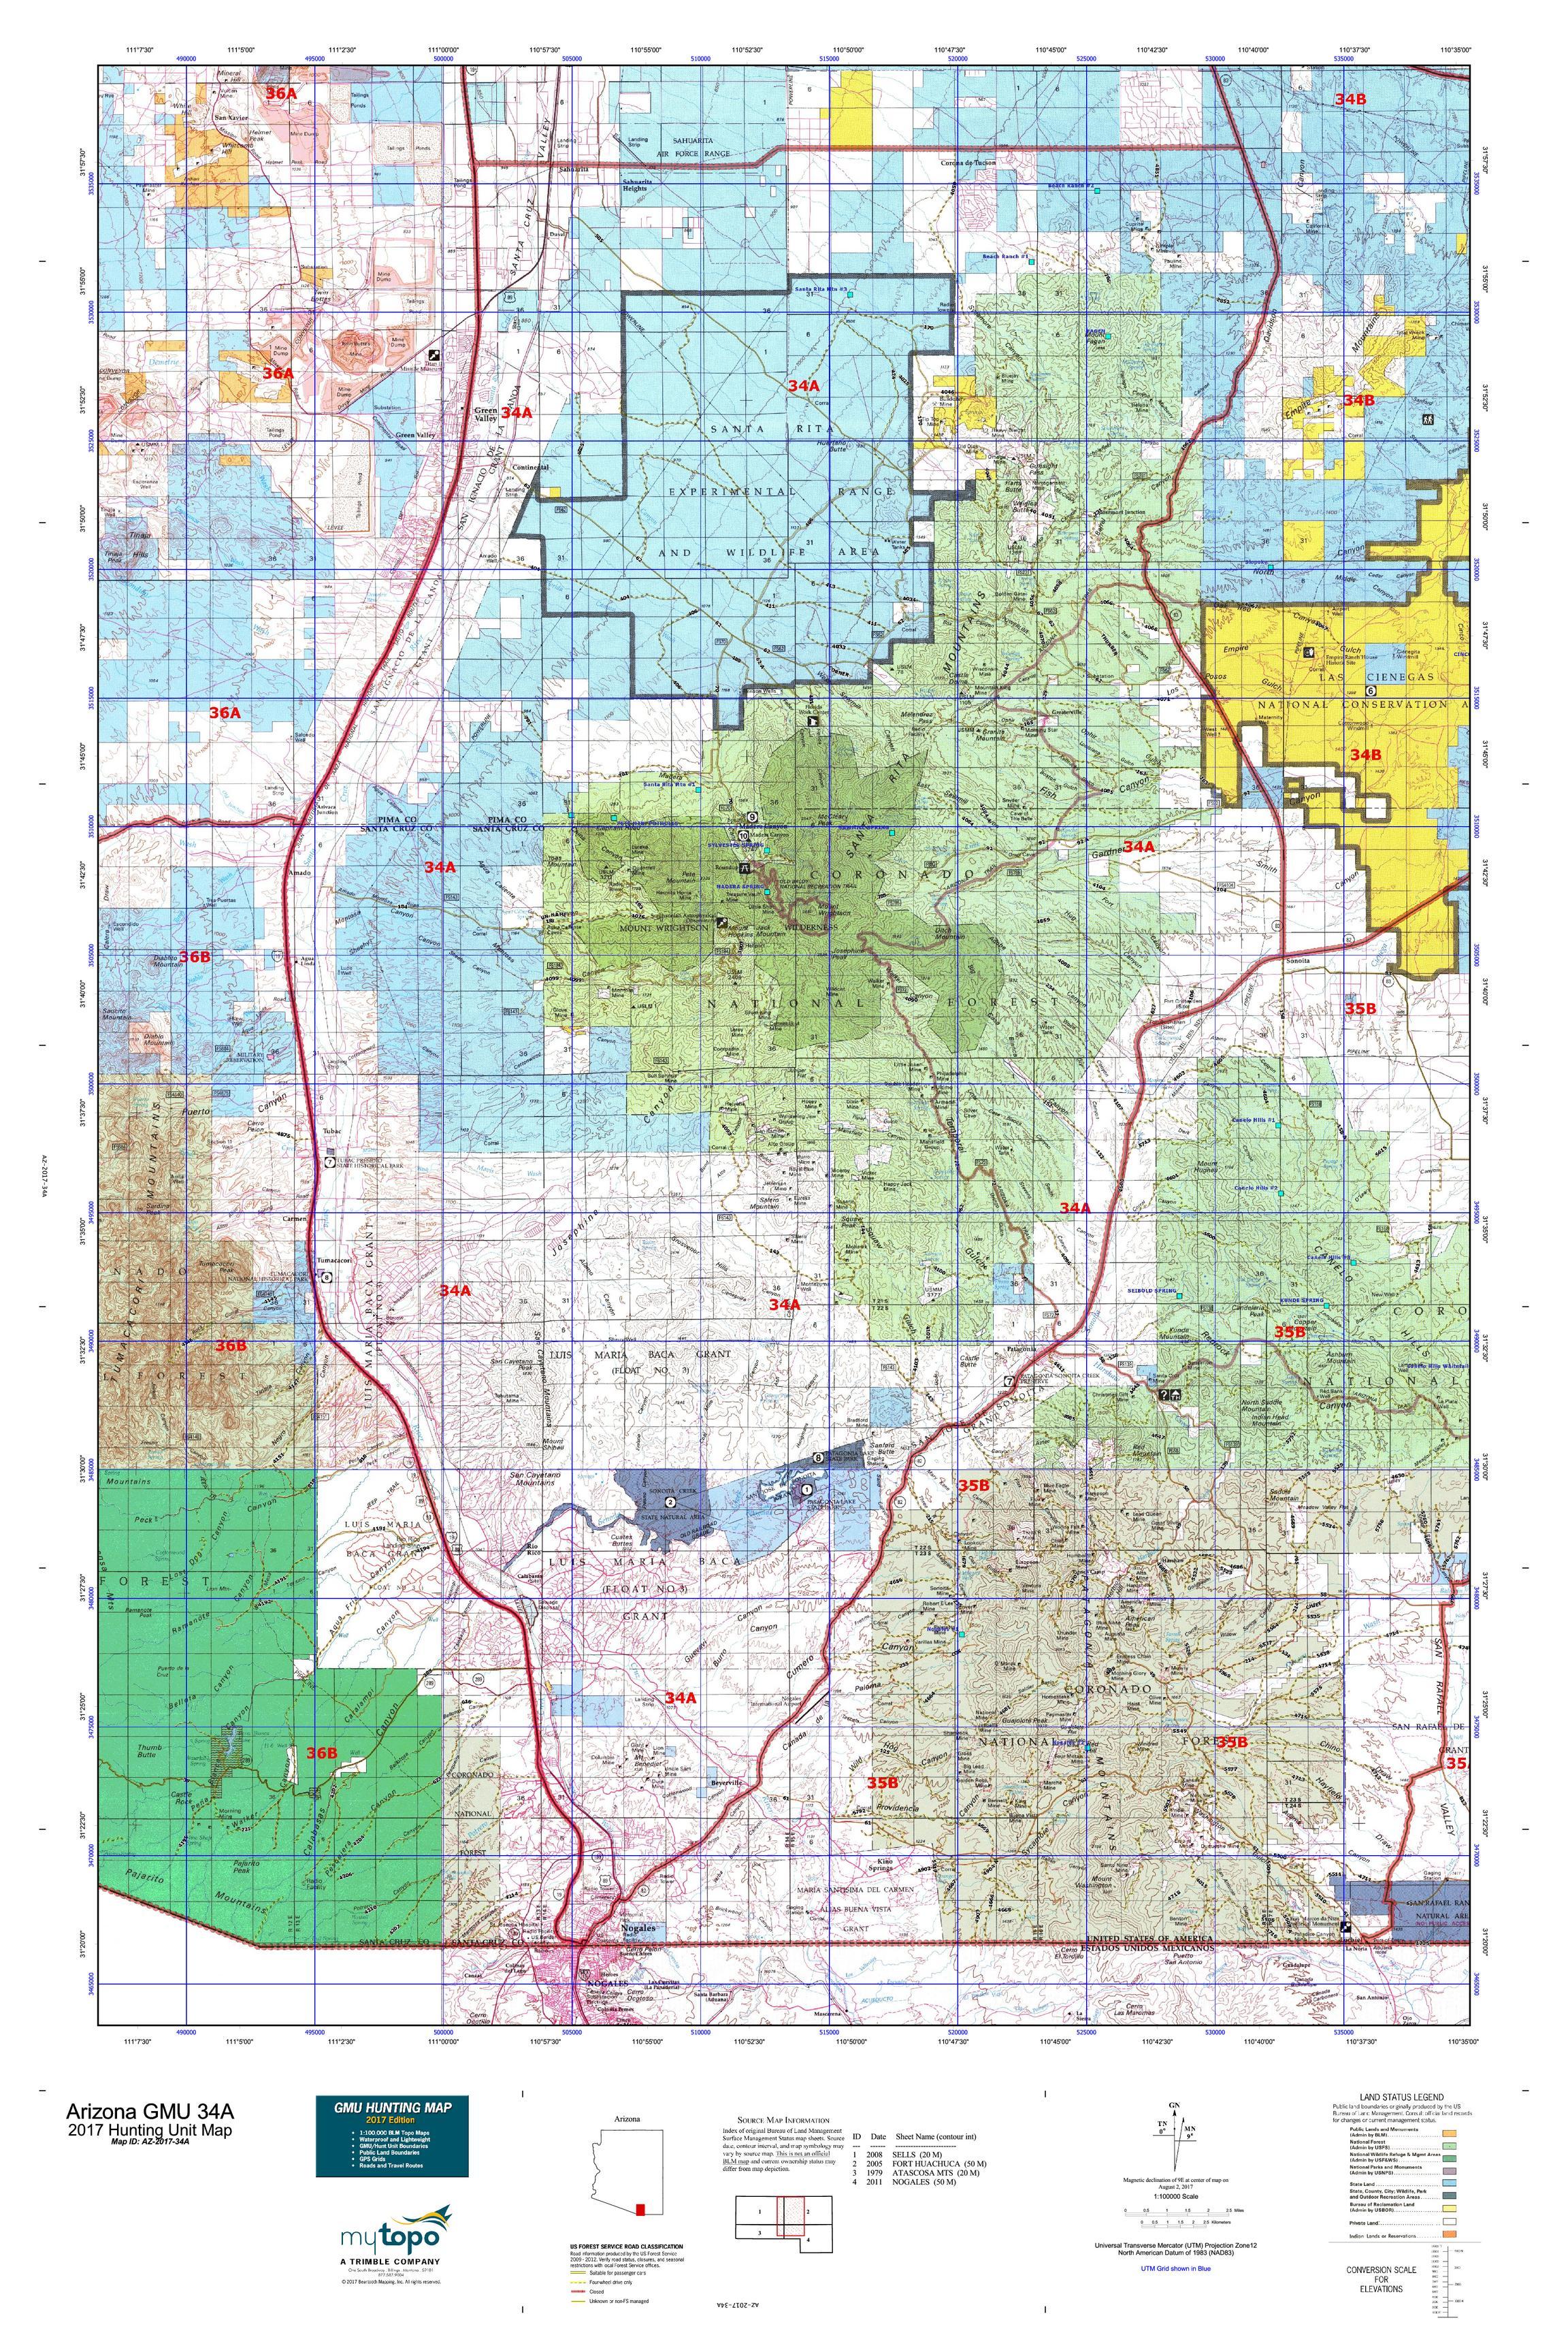 AZ-2017-34A Gmu Maps on uva map, georgetown map, kapiolani community college map, mount mercy university campus map, cnu map, vcu map, ohio university campus map, sfsu map, odu map, gcc map, jcu map, sac state map, gwu map, etsu campus map, gwynedd mercy university campus map, ccsu map, liberty university campus map, jmu map, mason map, bgsu map,